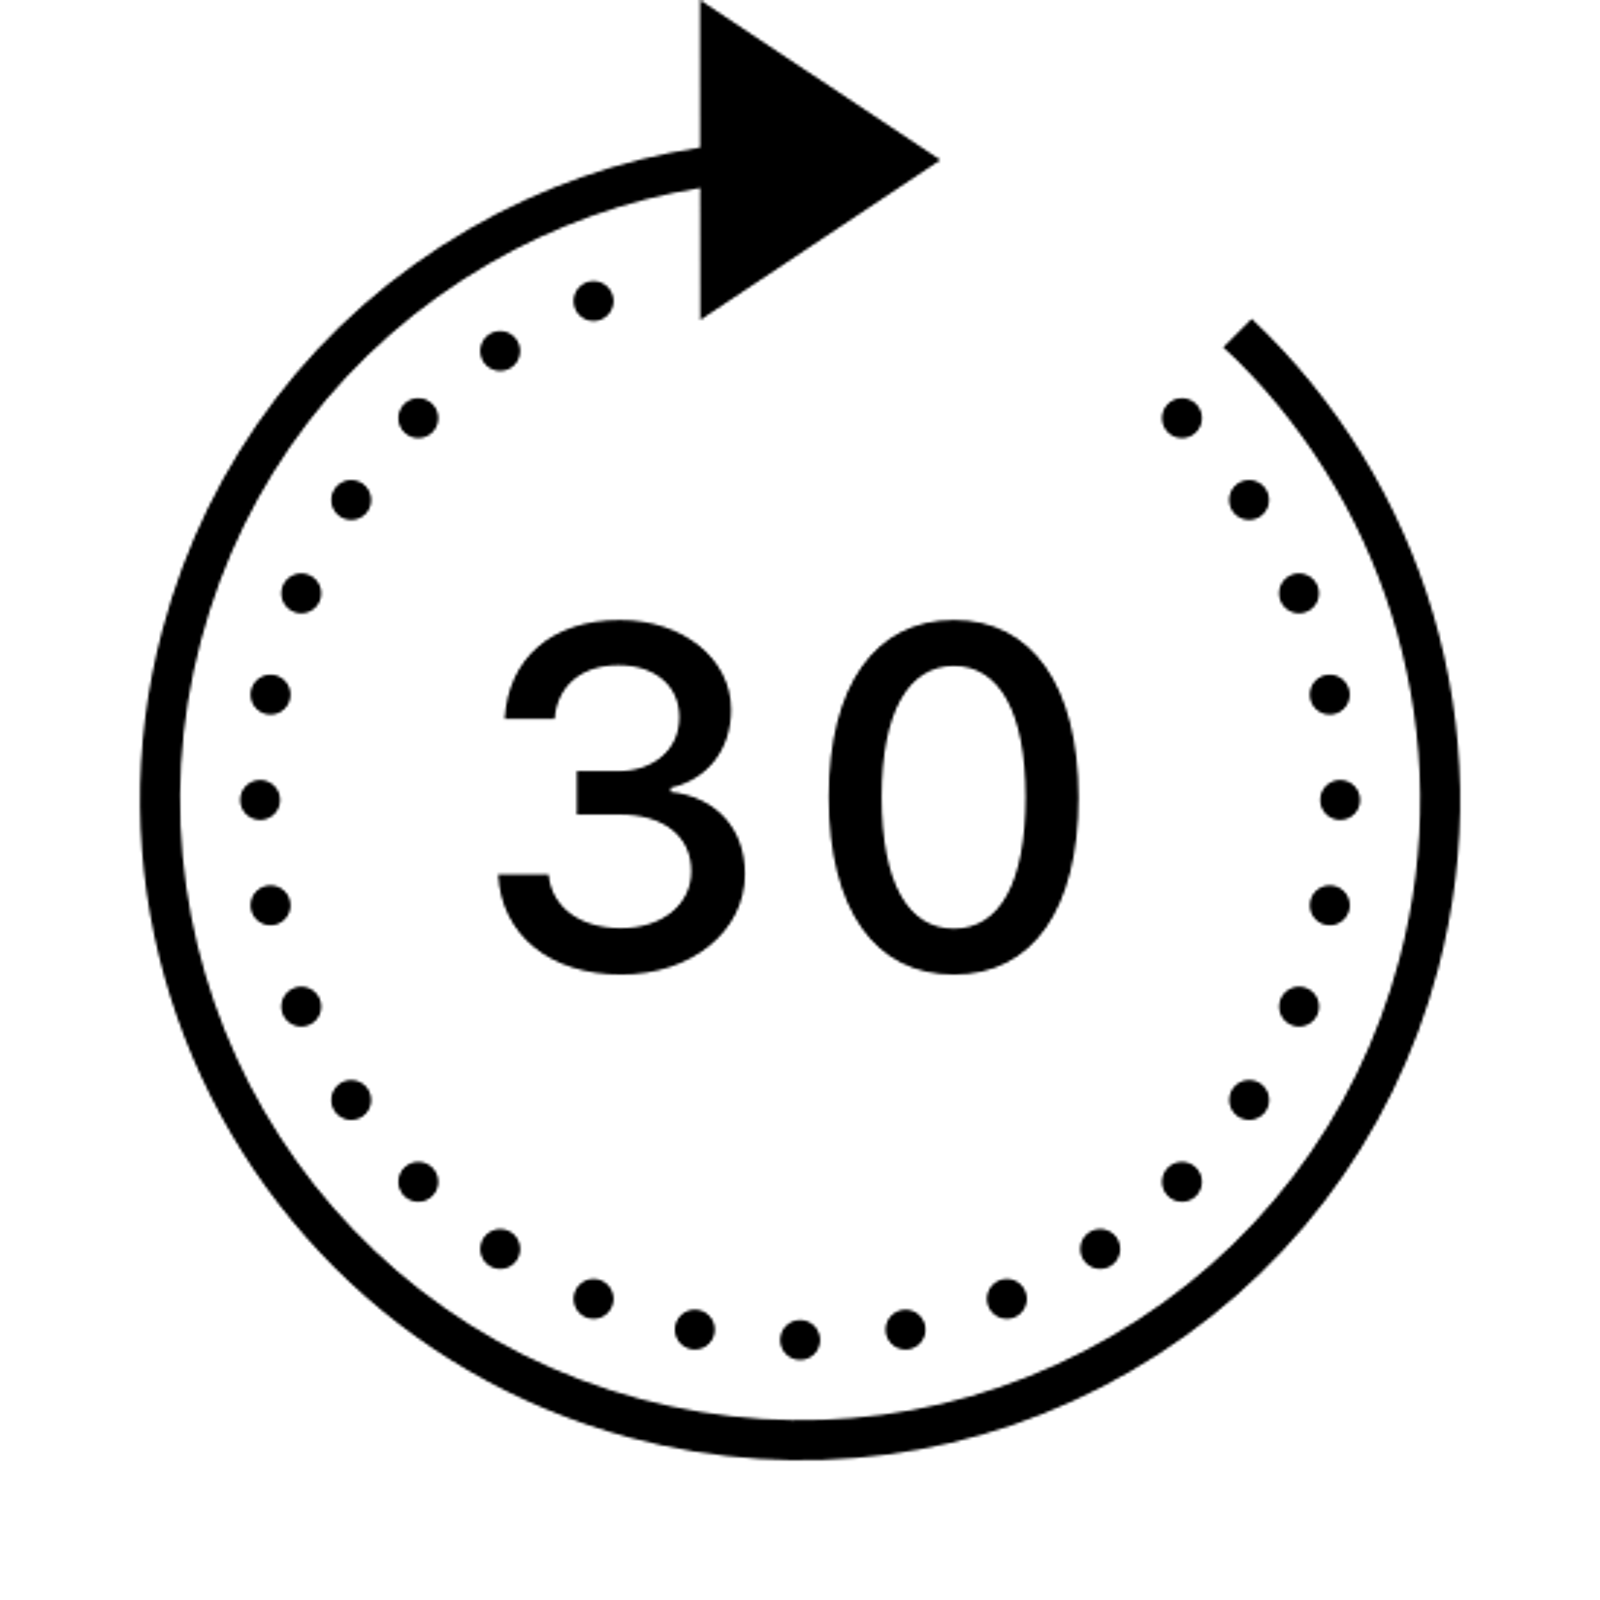 Forward 30 icon